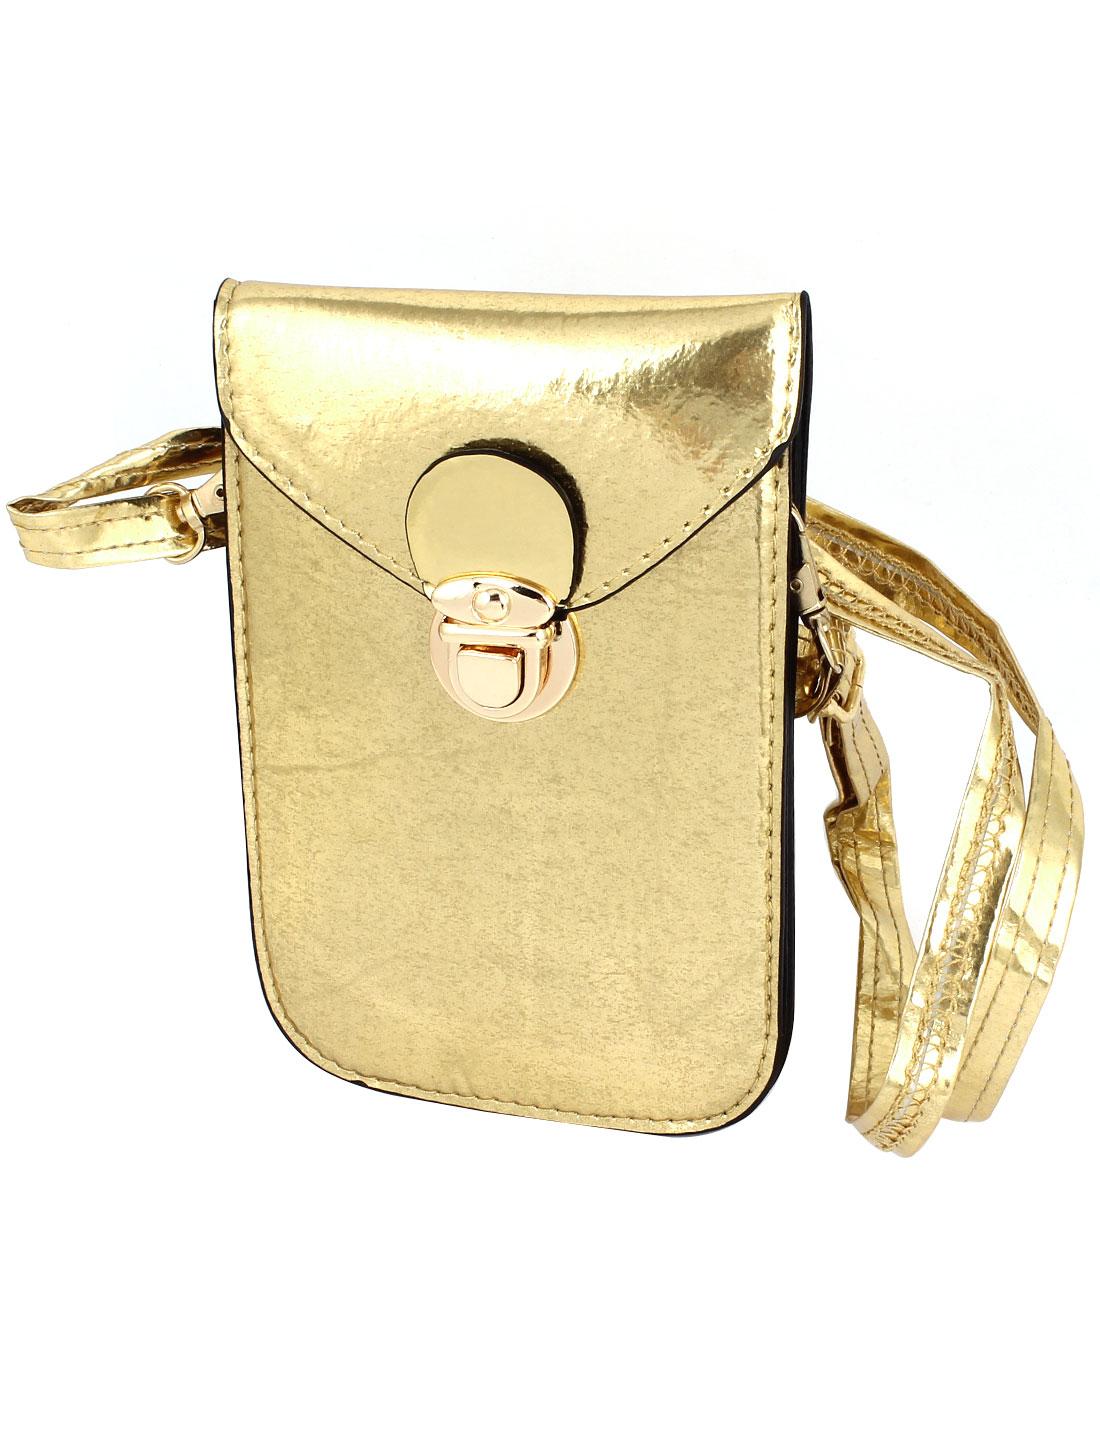 Ladies Faux Leather 2 Compartments Push Lock Closure Cross-Body Bag Purse Gold Tone